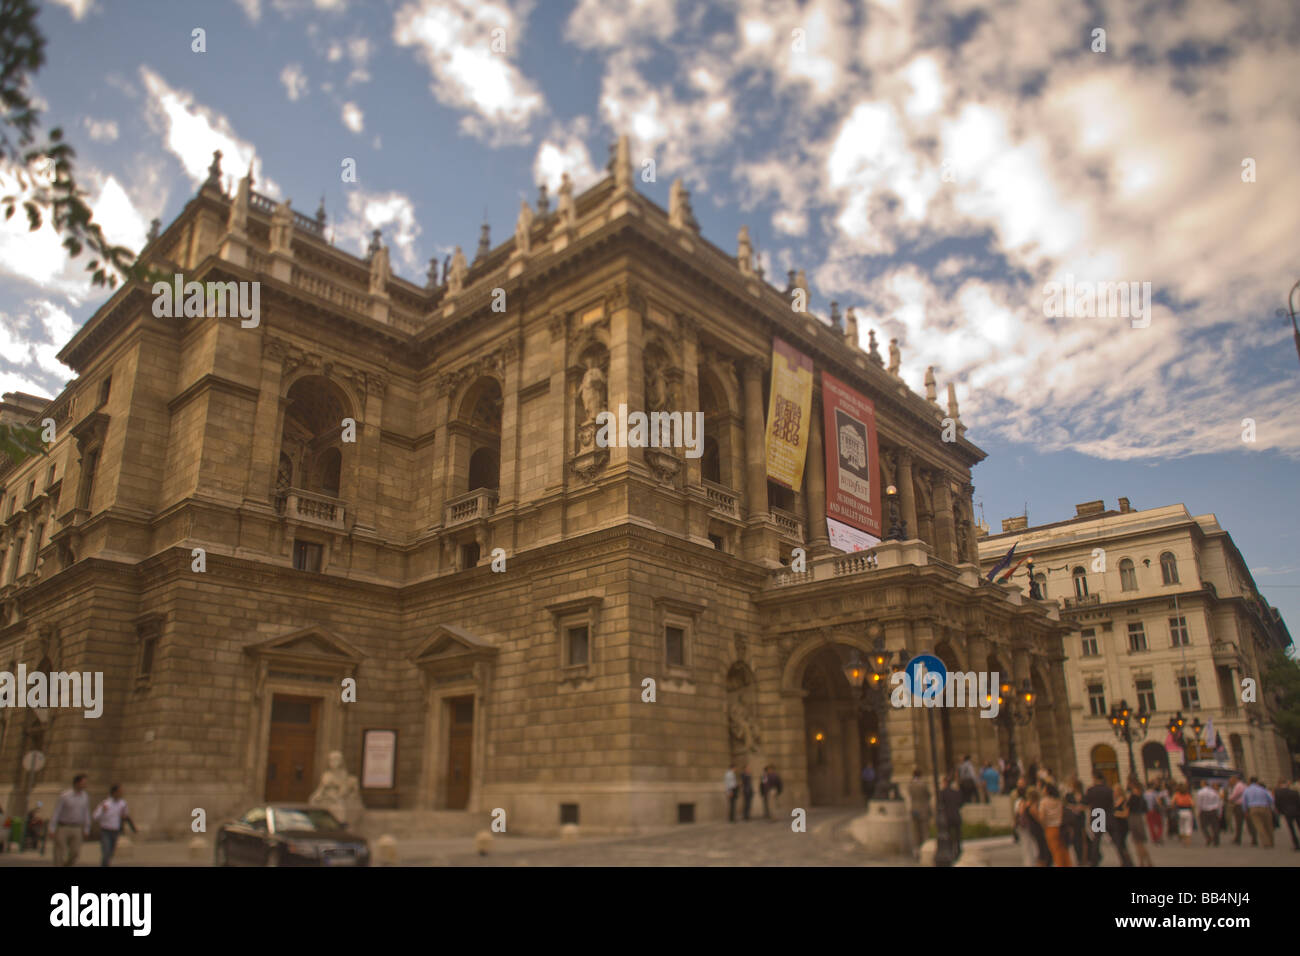 HUNGARY, Budapest. Allami Operahaz (State Opera House) (RF) - Stock Image